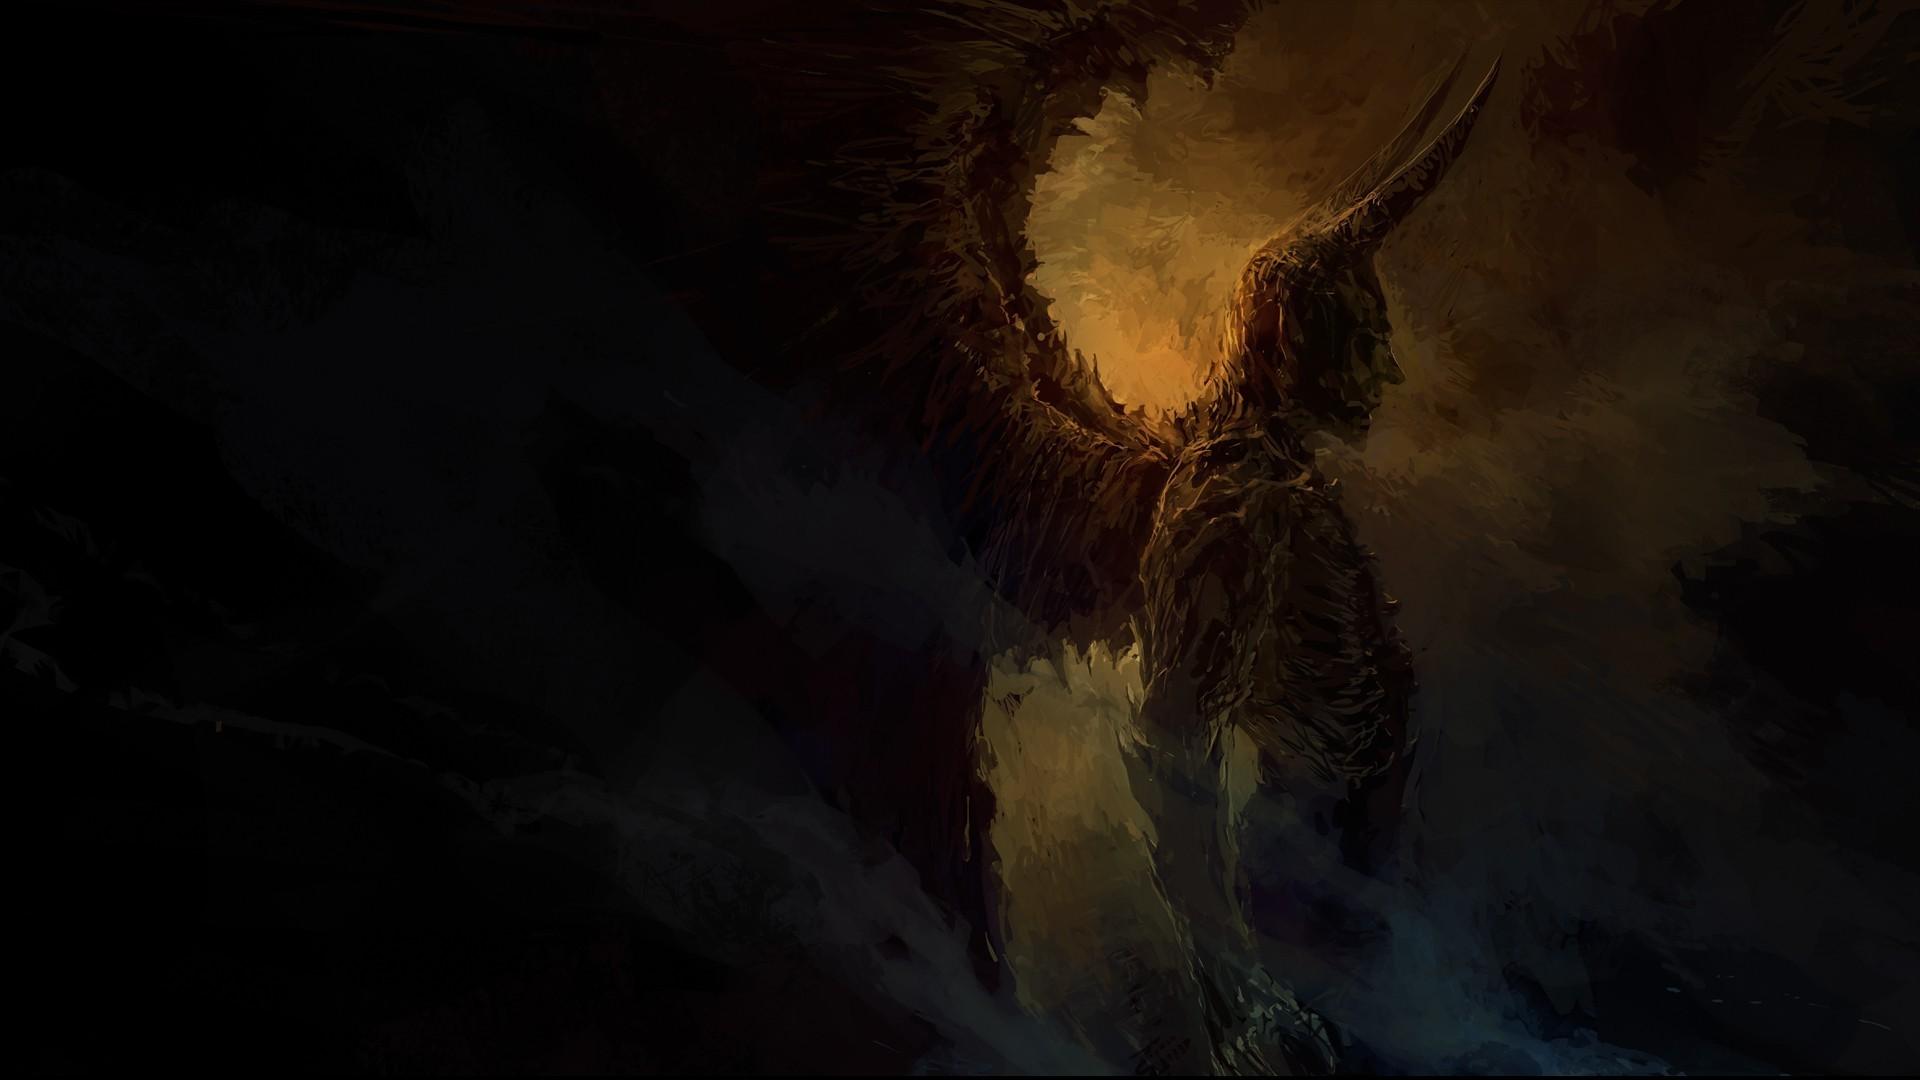 Devil Wallpapers RND - SH VM Backgrounds Collection